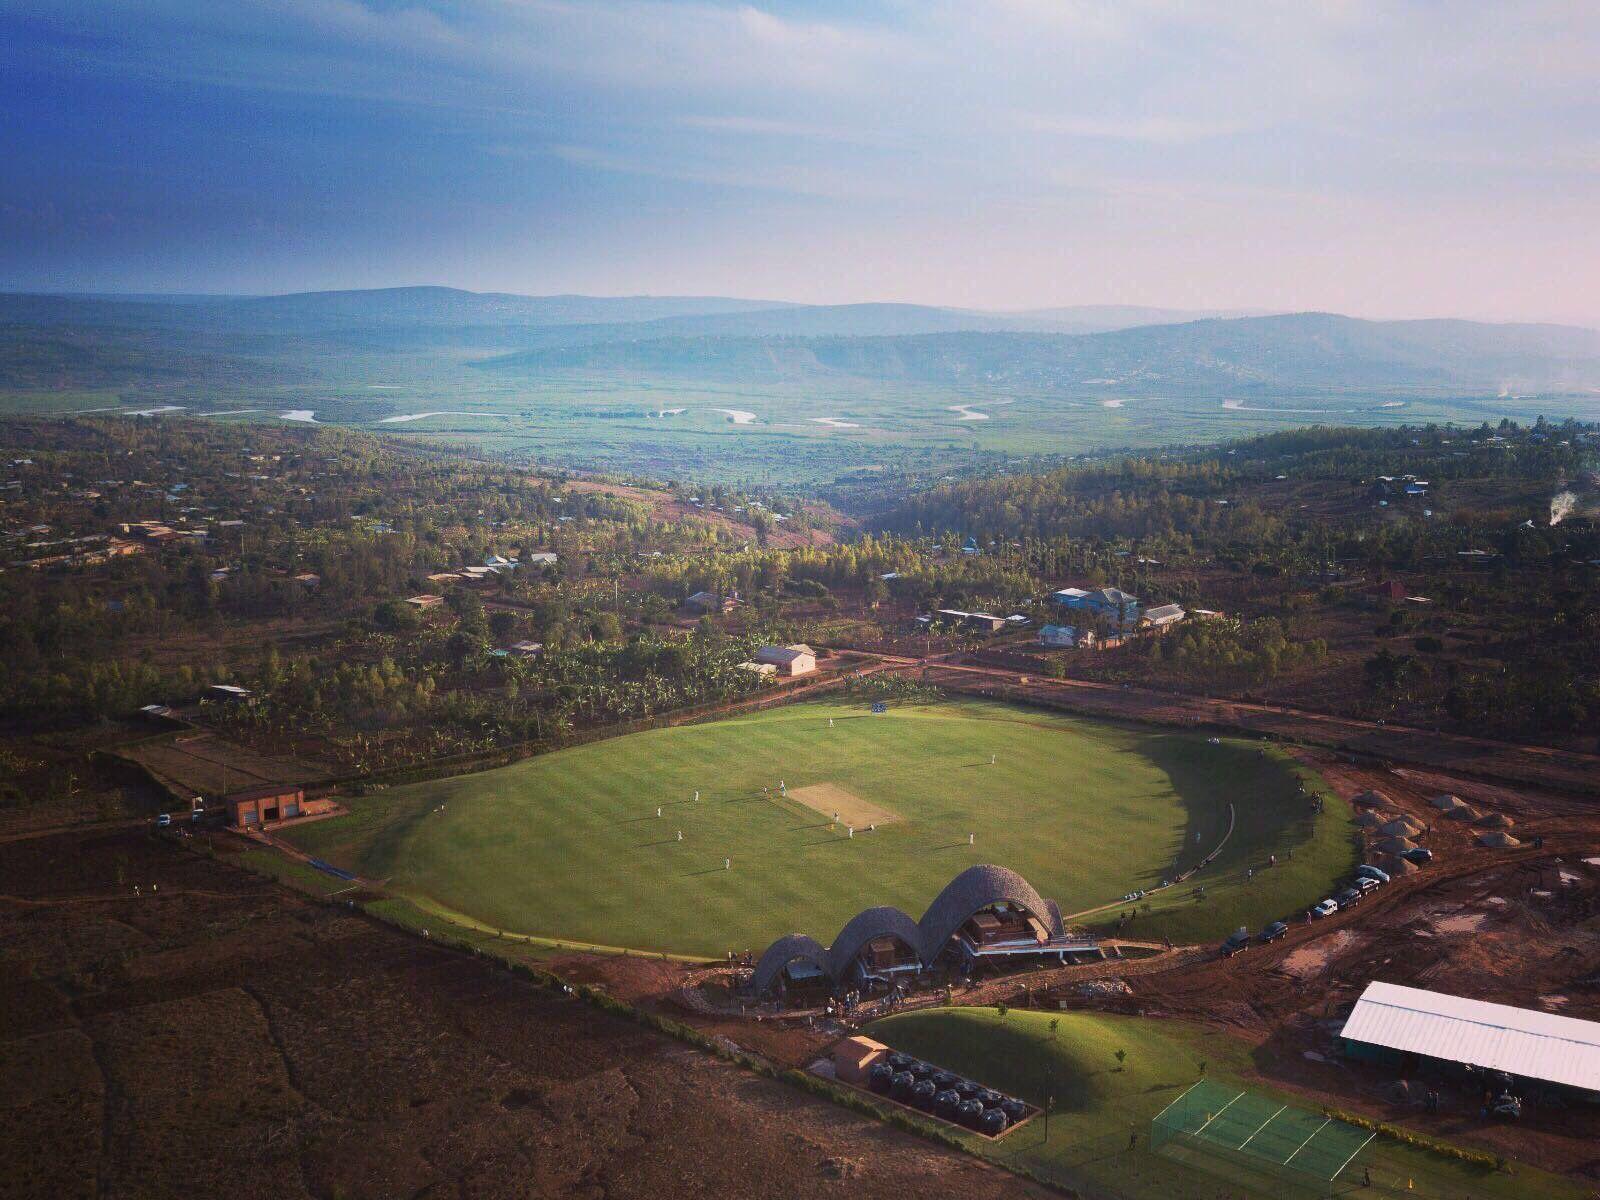 The Gahanga Cricket Stadium in Rwanda enjoys views across Kigali's rolling landscape